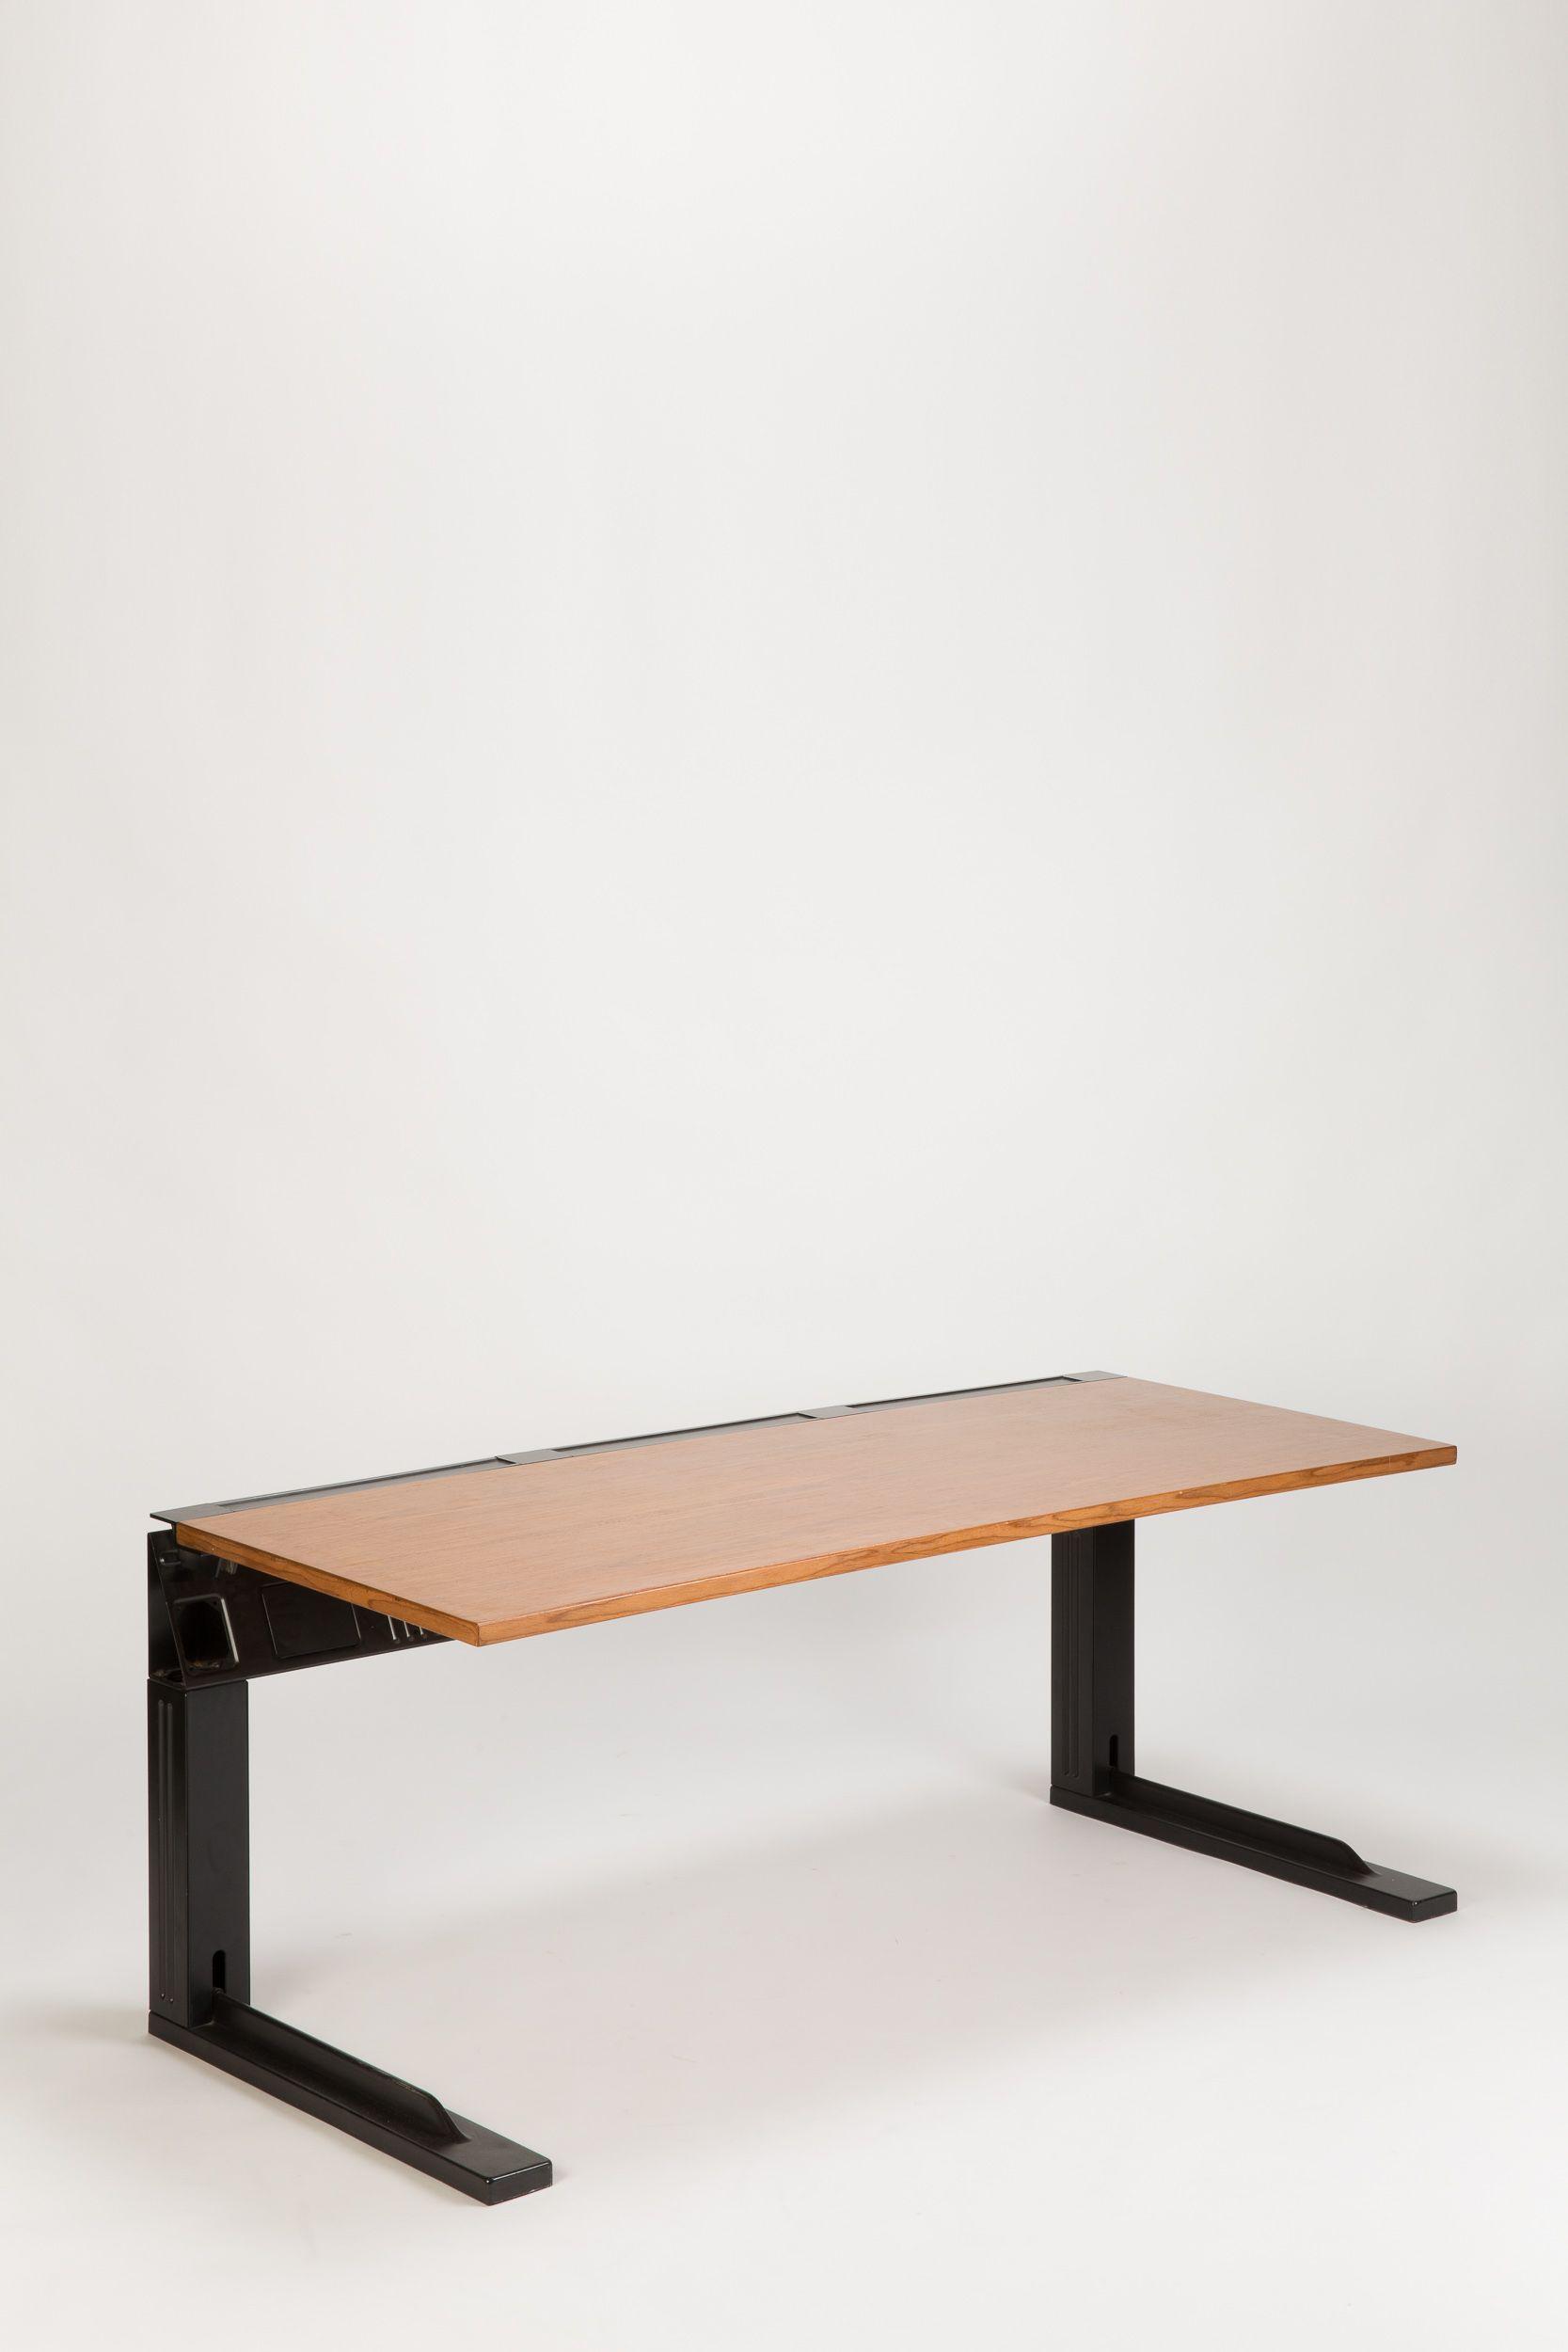 Richard Sapper Desk Nine To Five Chaise Fauteuil Mobilier Chaise